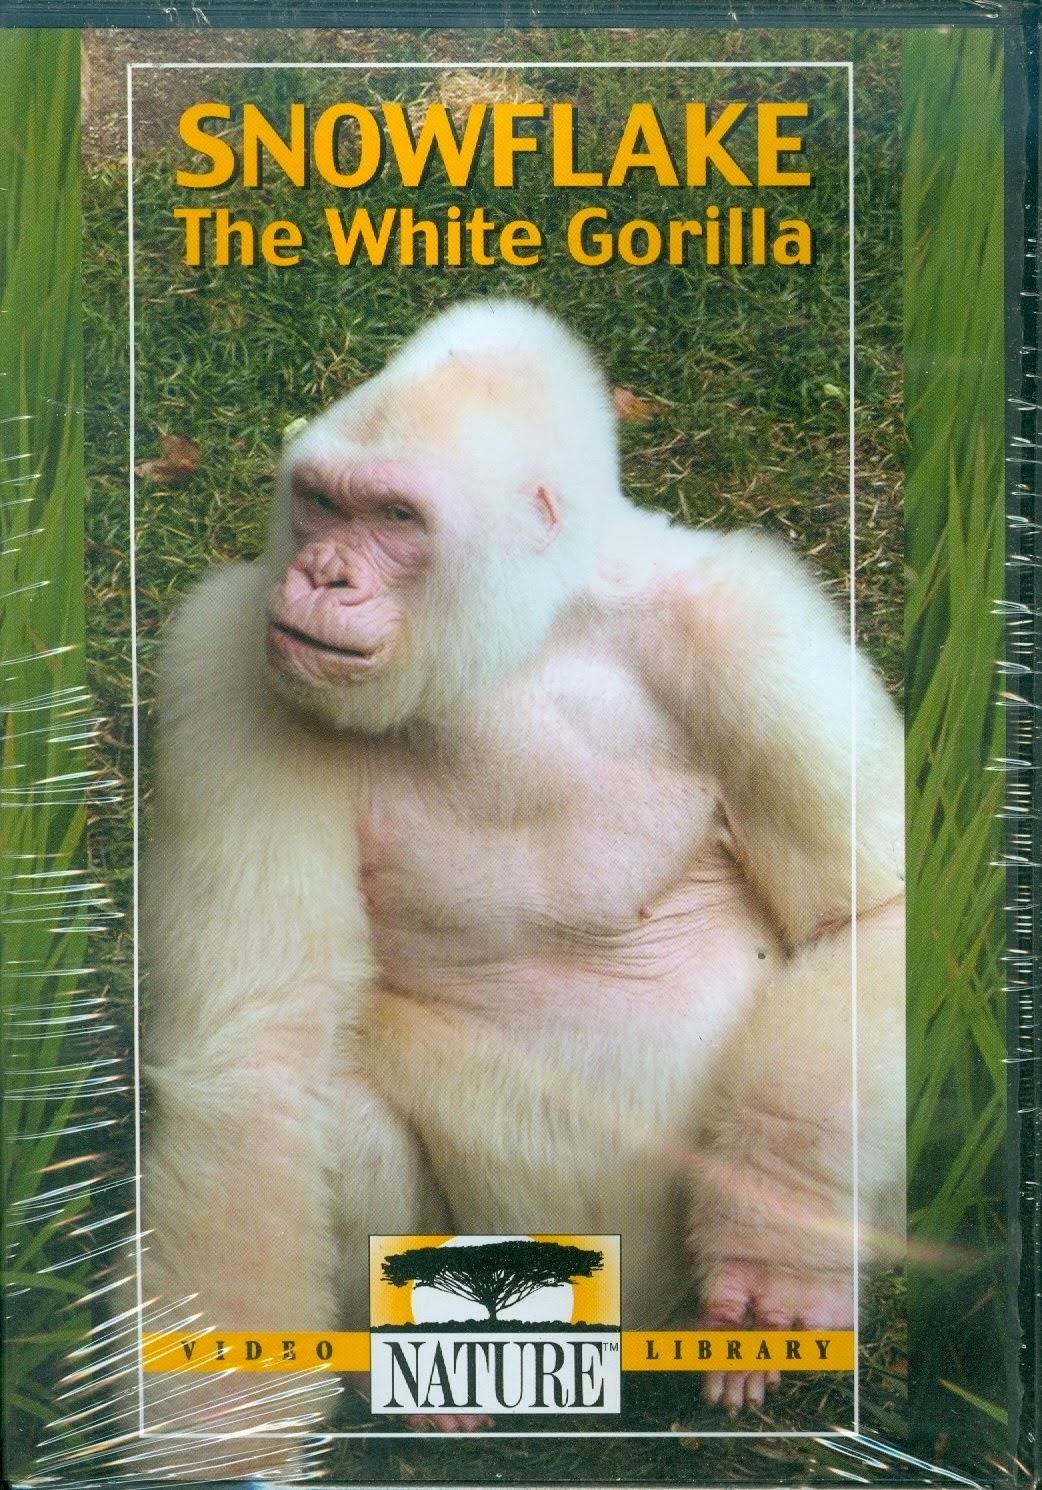 Uncategorized Snowflake The White Gorilla snowflake the white gorilla images best chimpanzee and 2016 rotten tomatoes